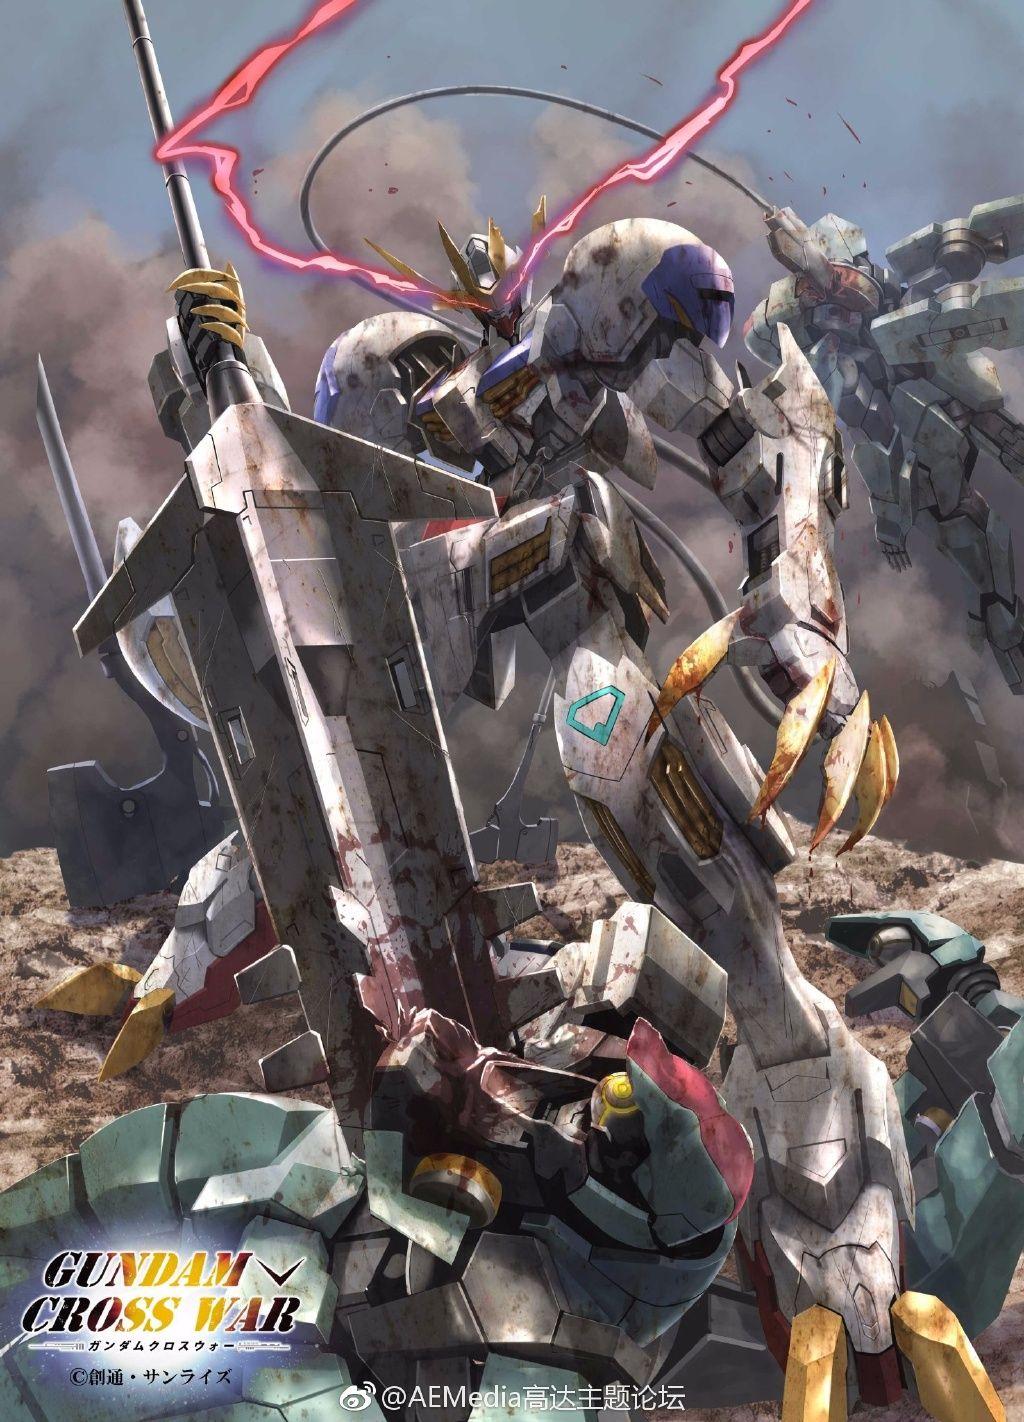 Gundam Cross War Mobile Phone Size Wallpapers Gundam Kits Collection News And Reviews Gundam Gundam Wallpapers Gundam Art